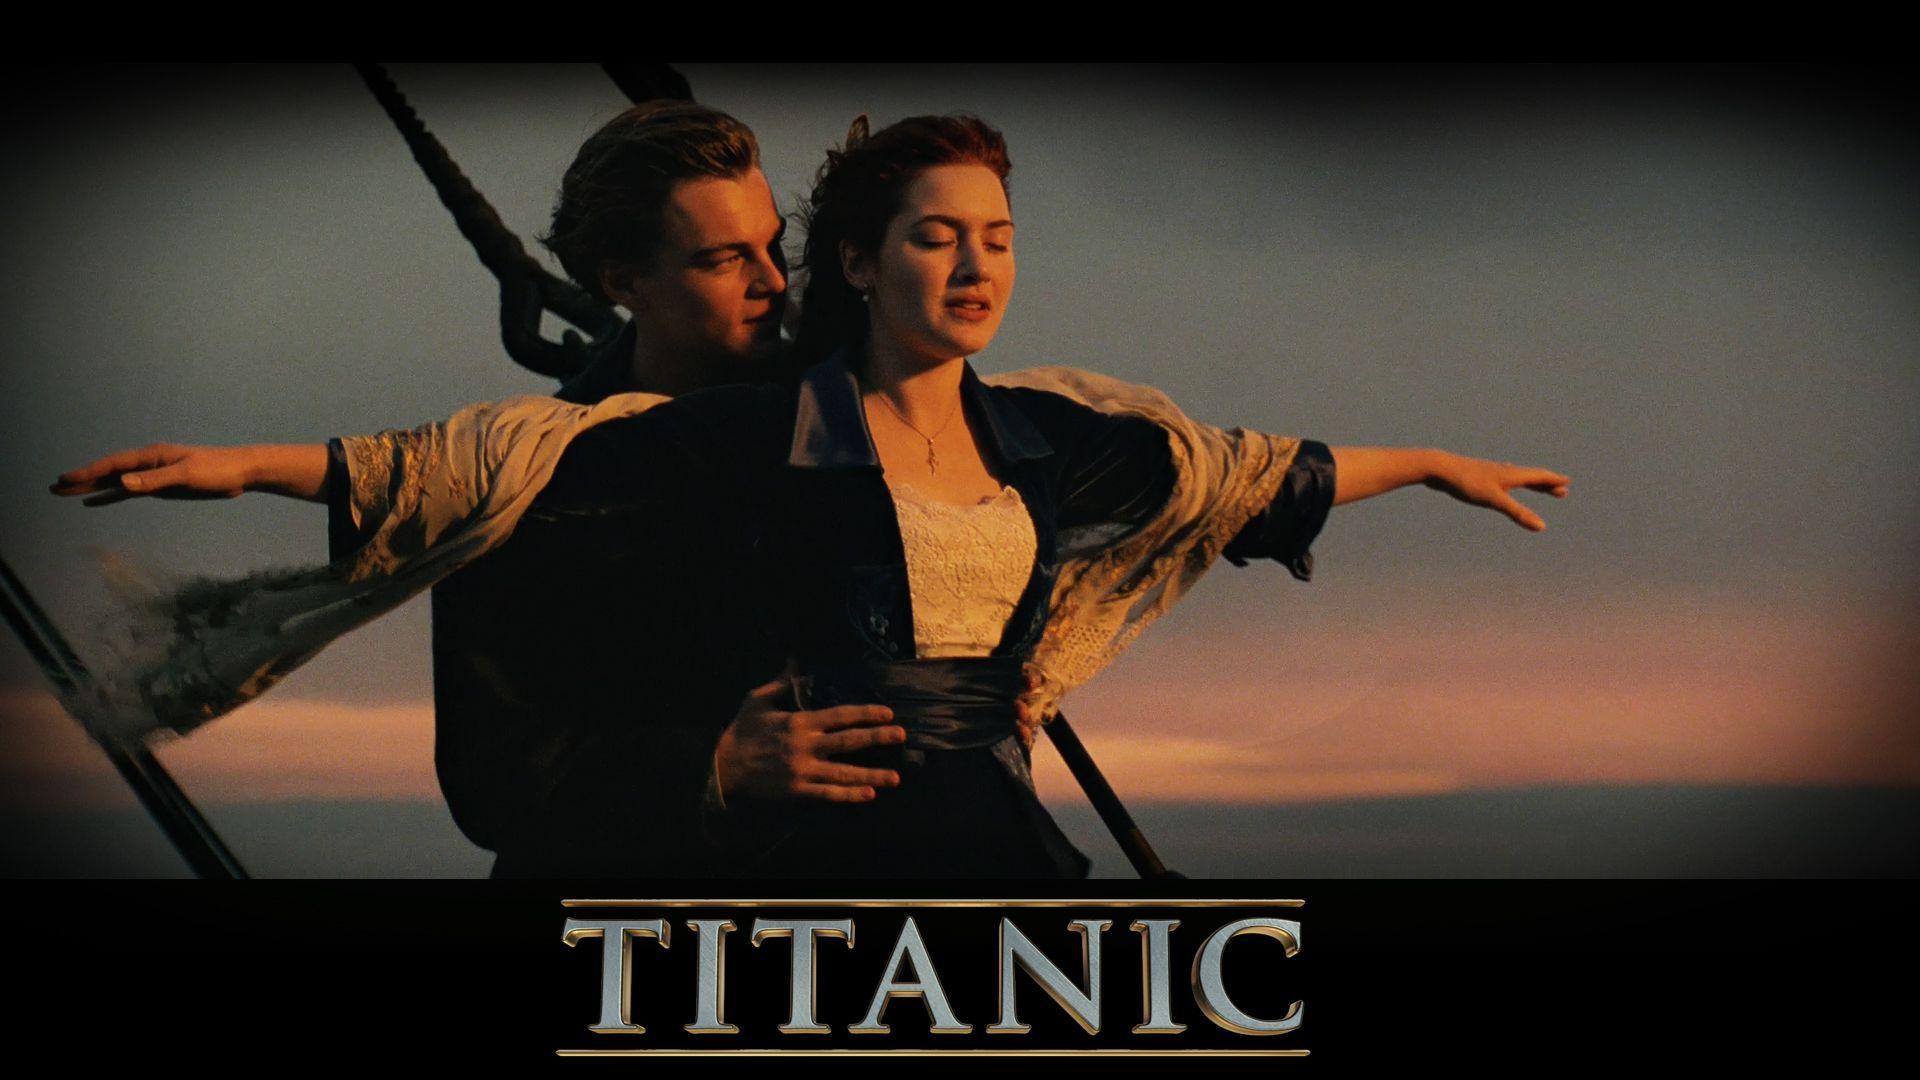 titanic wallpaper   titanic wallpaper - Part 2